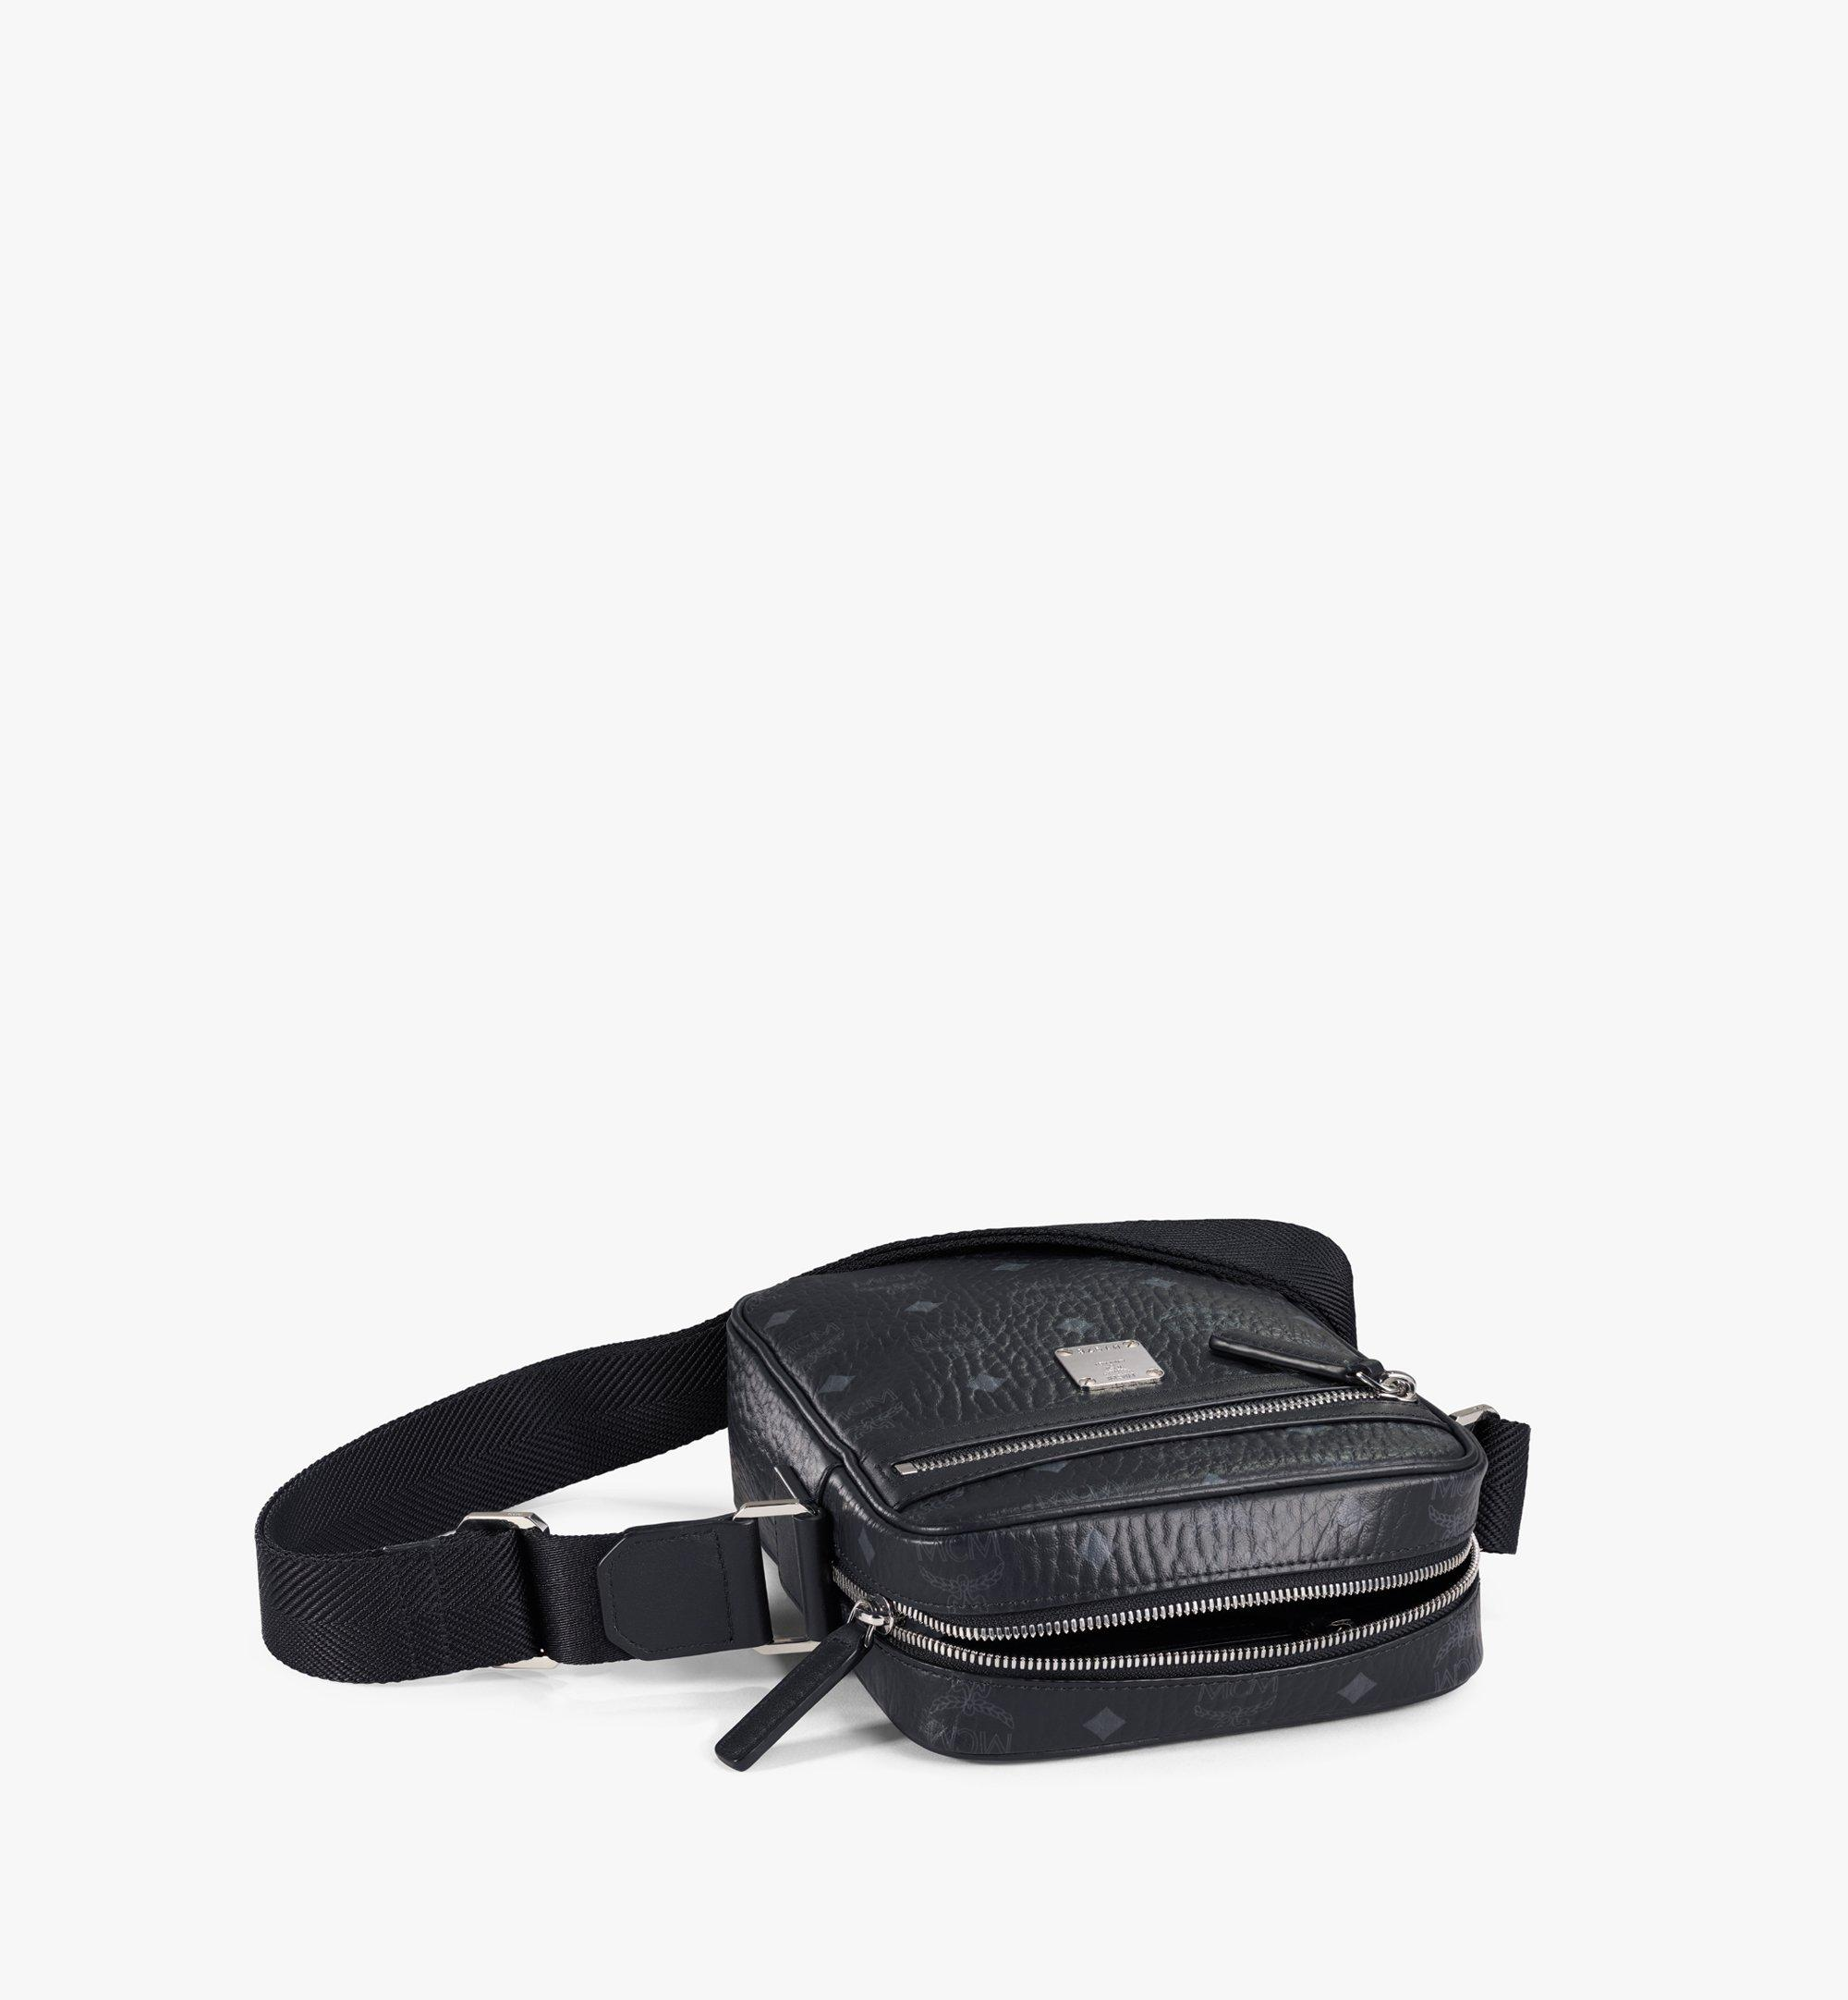 MCM Klassik Crossbody-Tasche in Visetos Black MMRAAKC04BK001 Noch mehr sehen 2